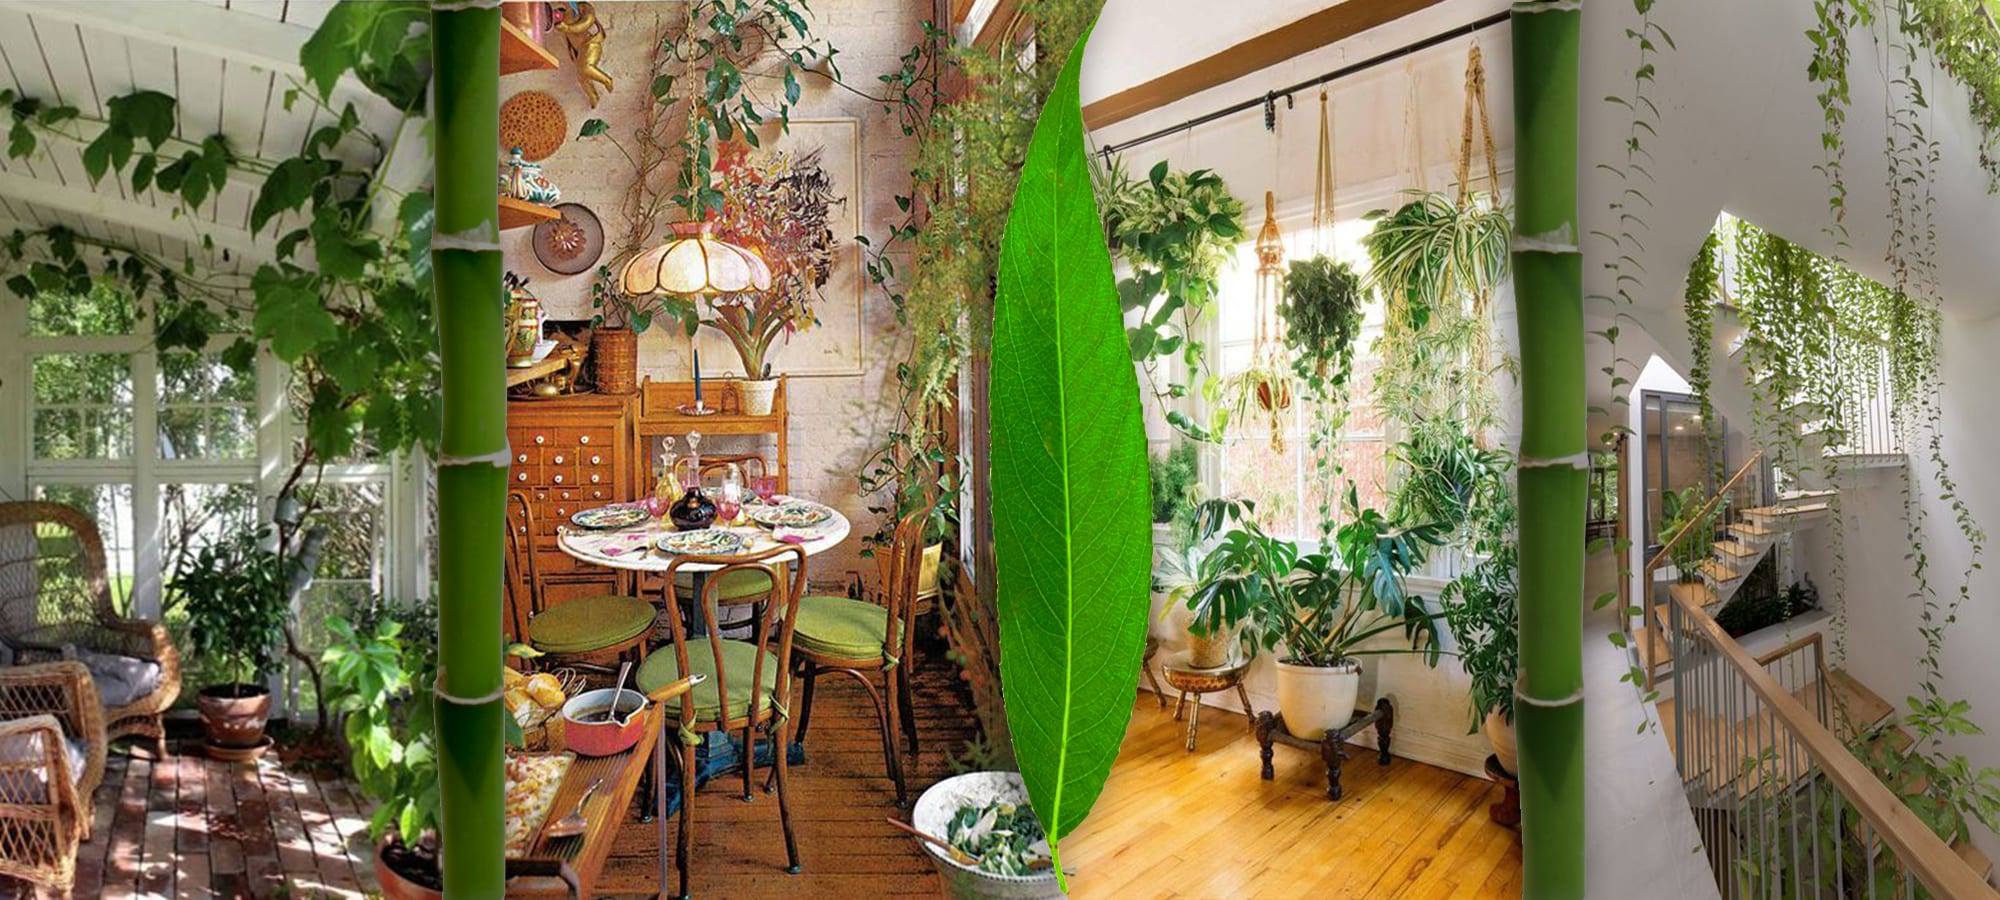 House Plants in Interior Design